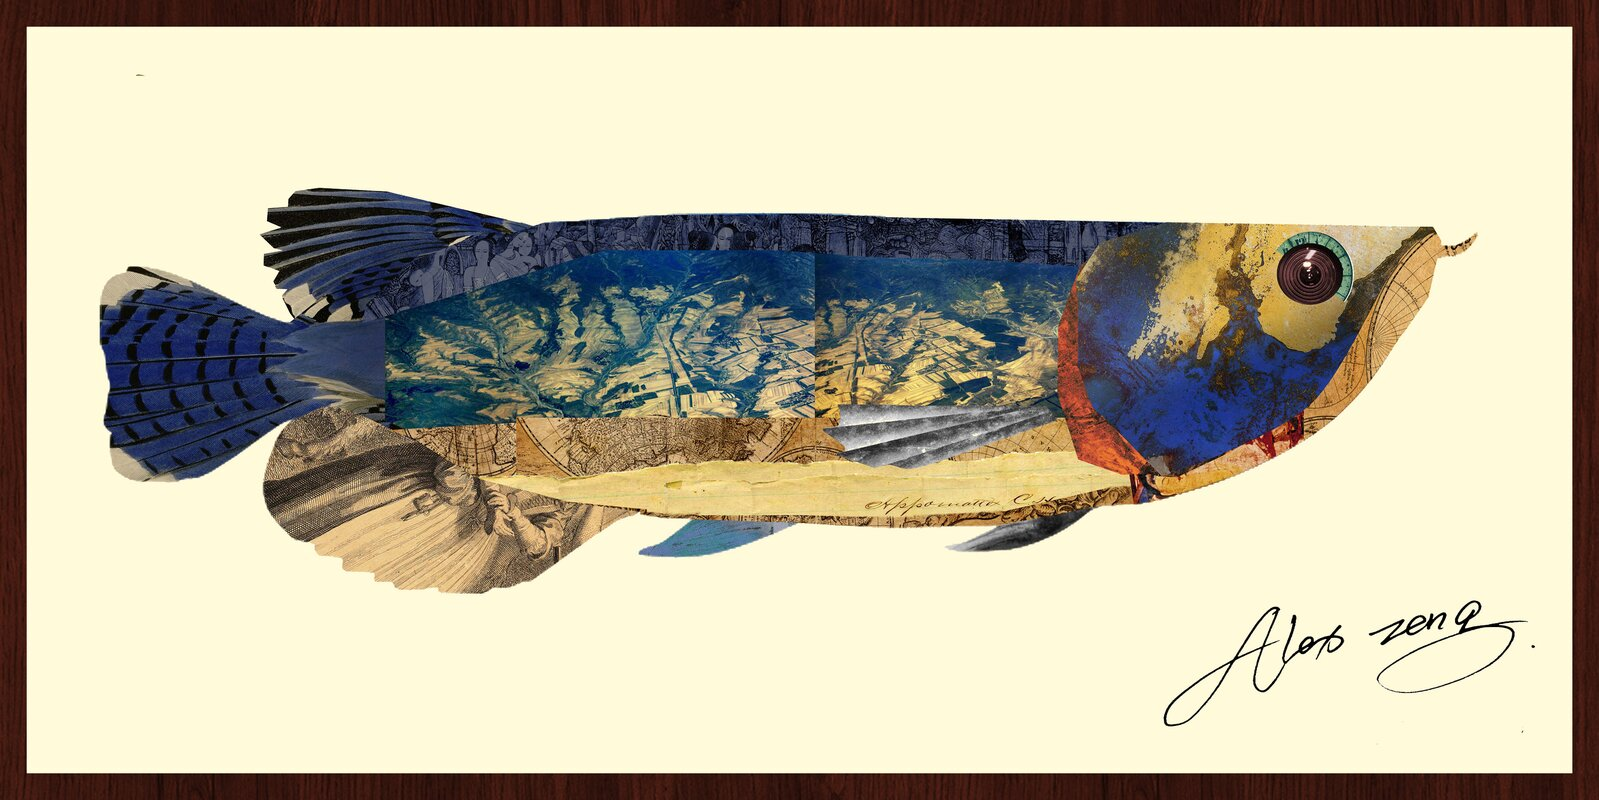 Empire art direct arowana fish dimensional collage hand for Arowana fish tank decoration